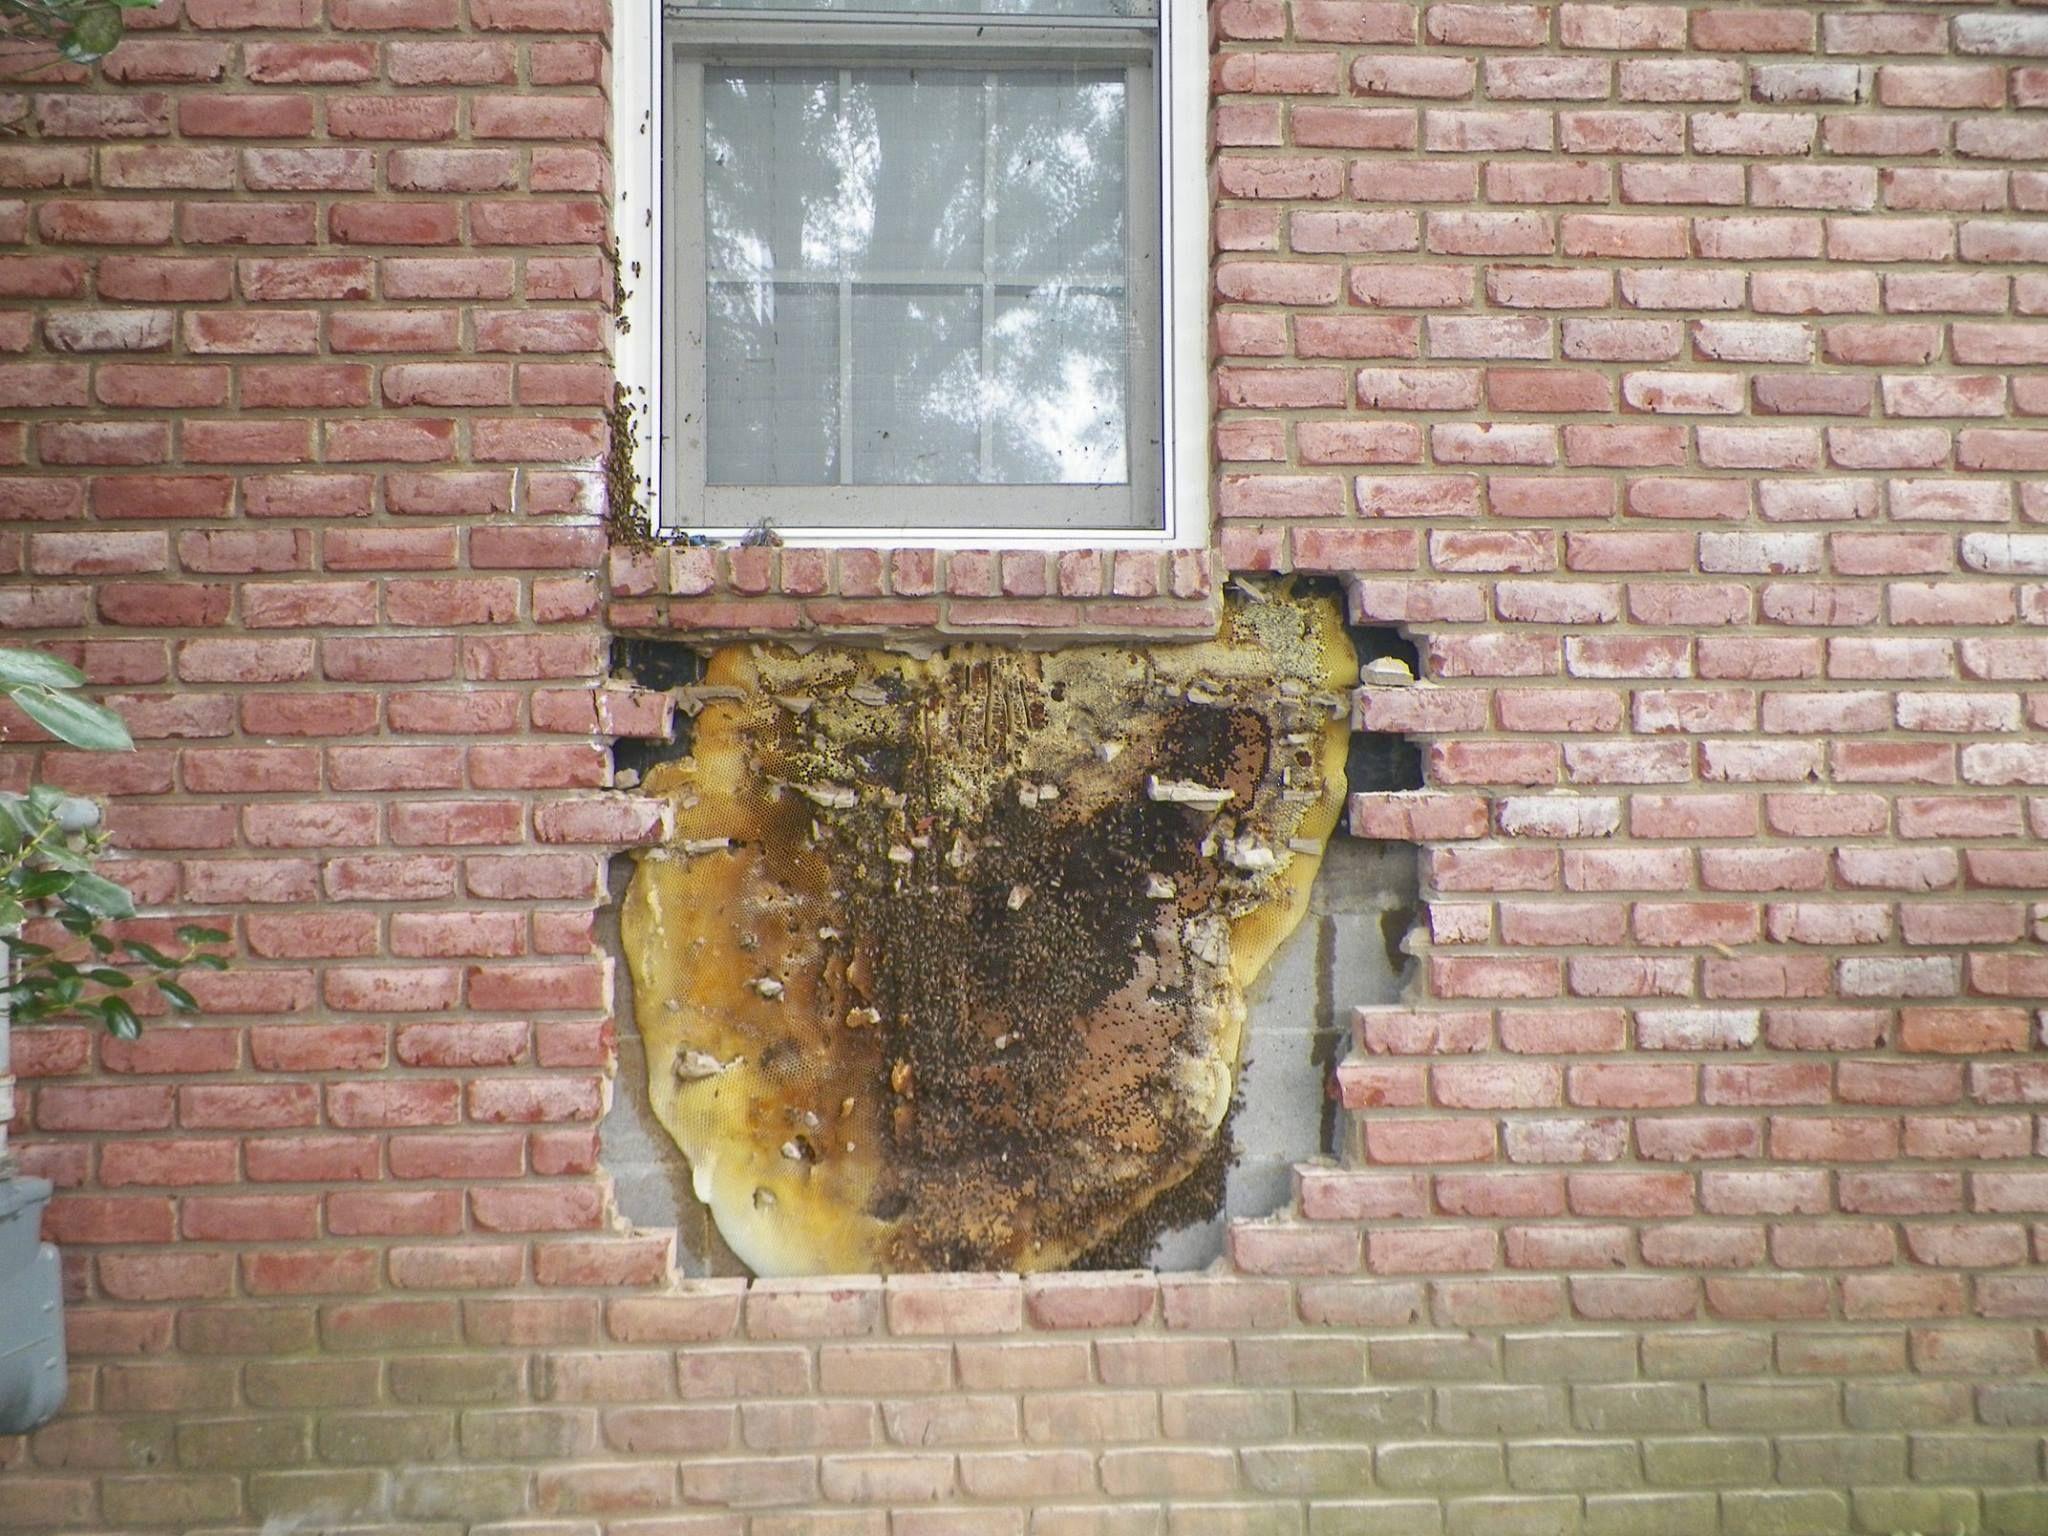 Bee hive in brick wall